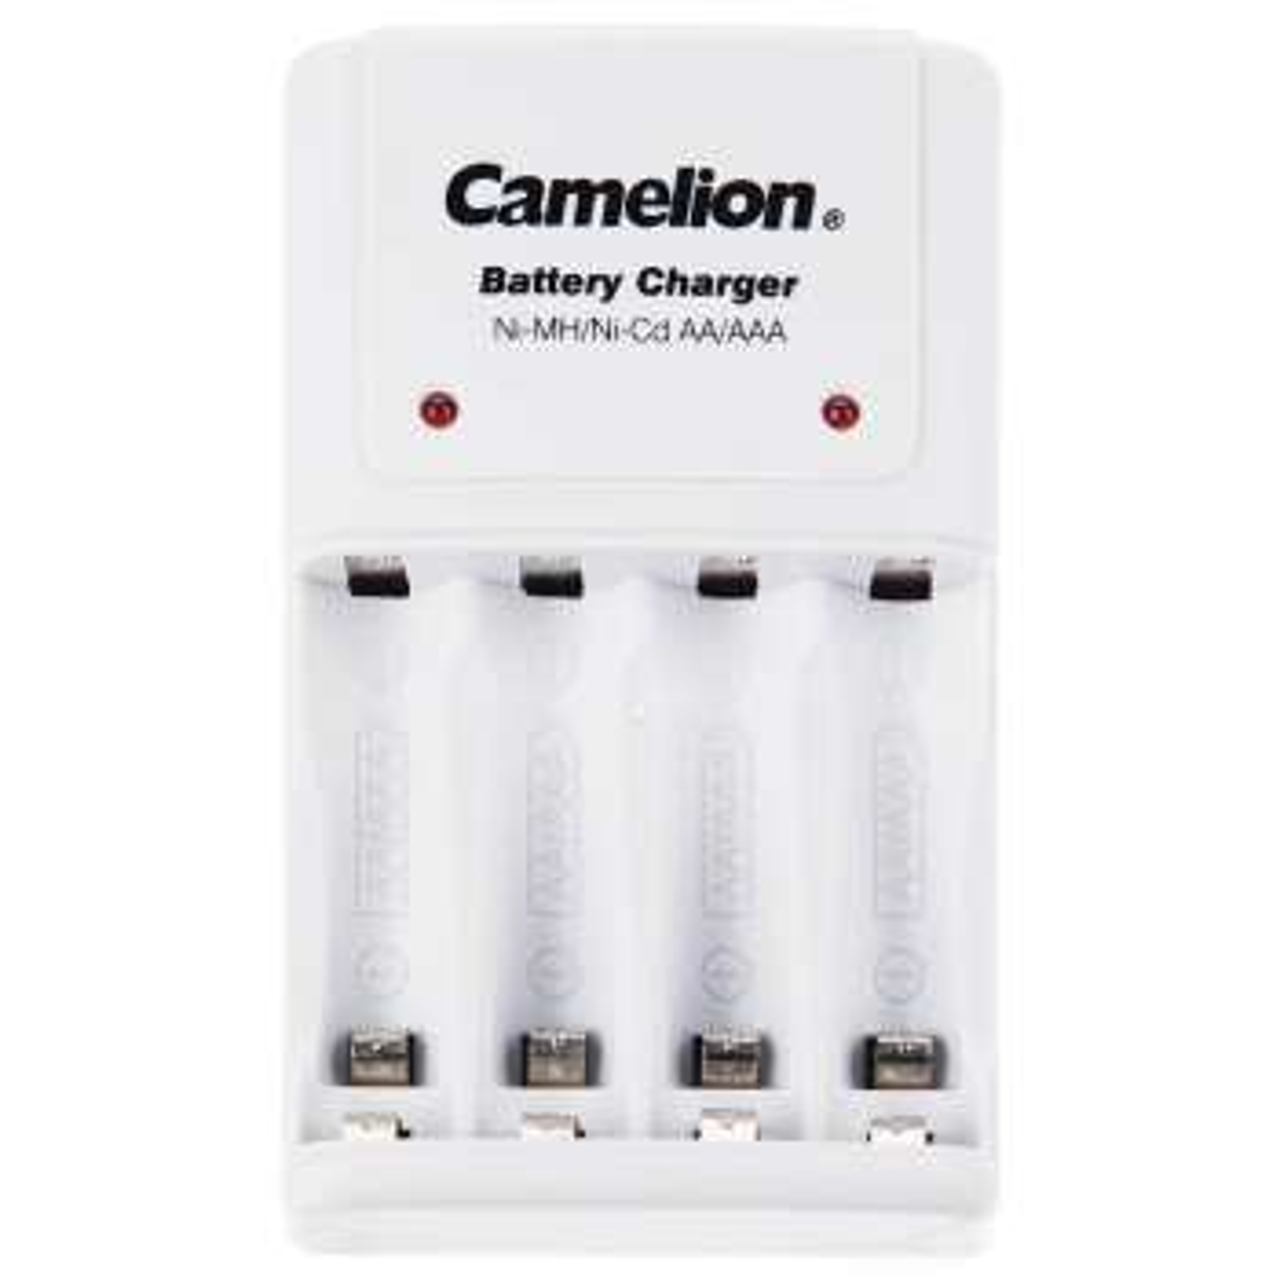 شارژر باتری کملیون BC-1010B